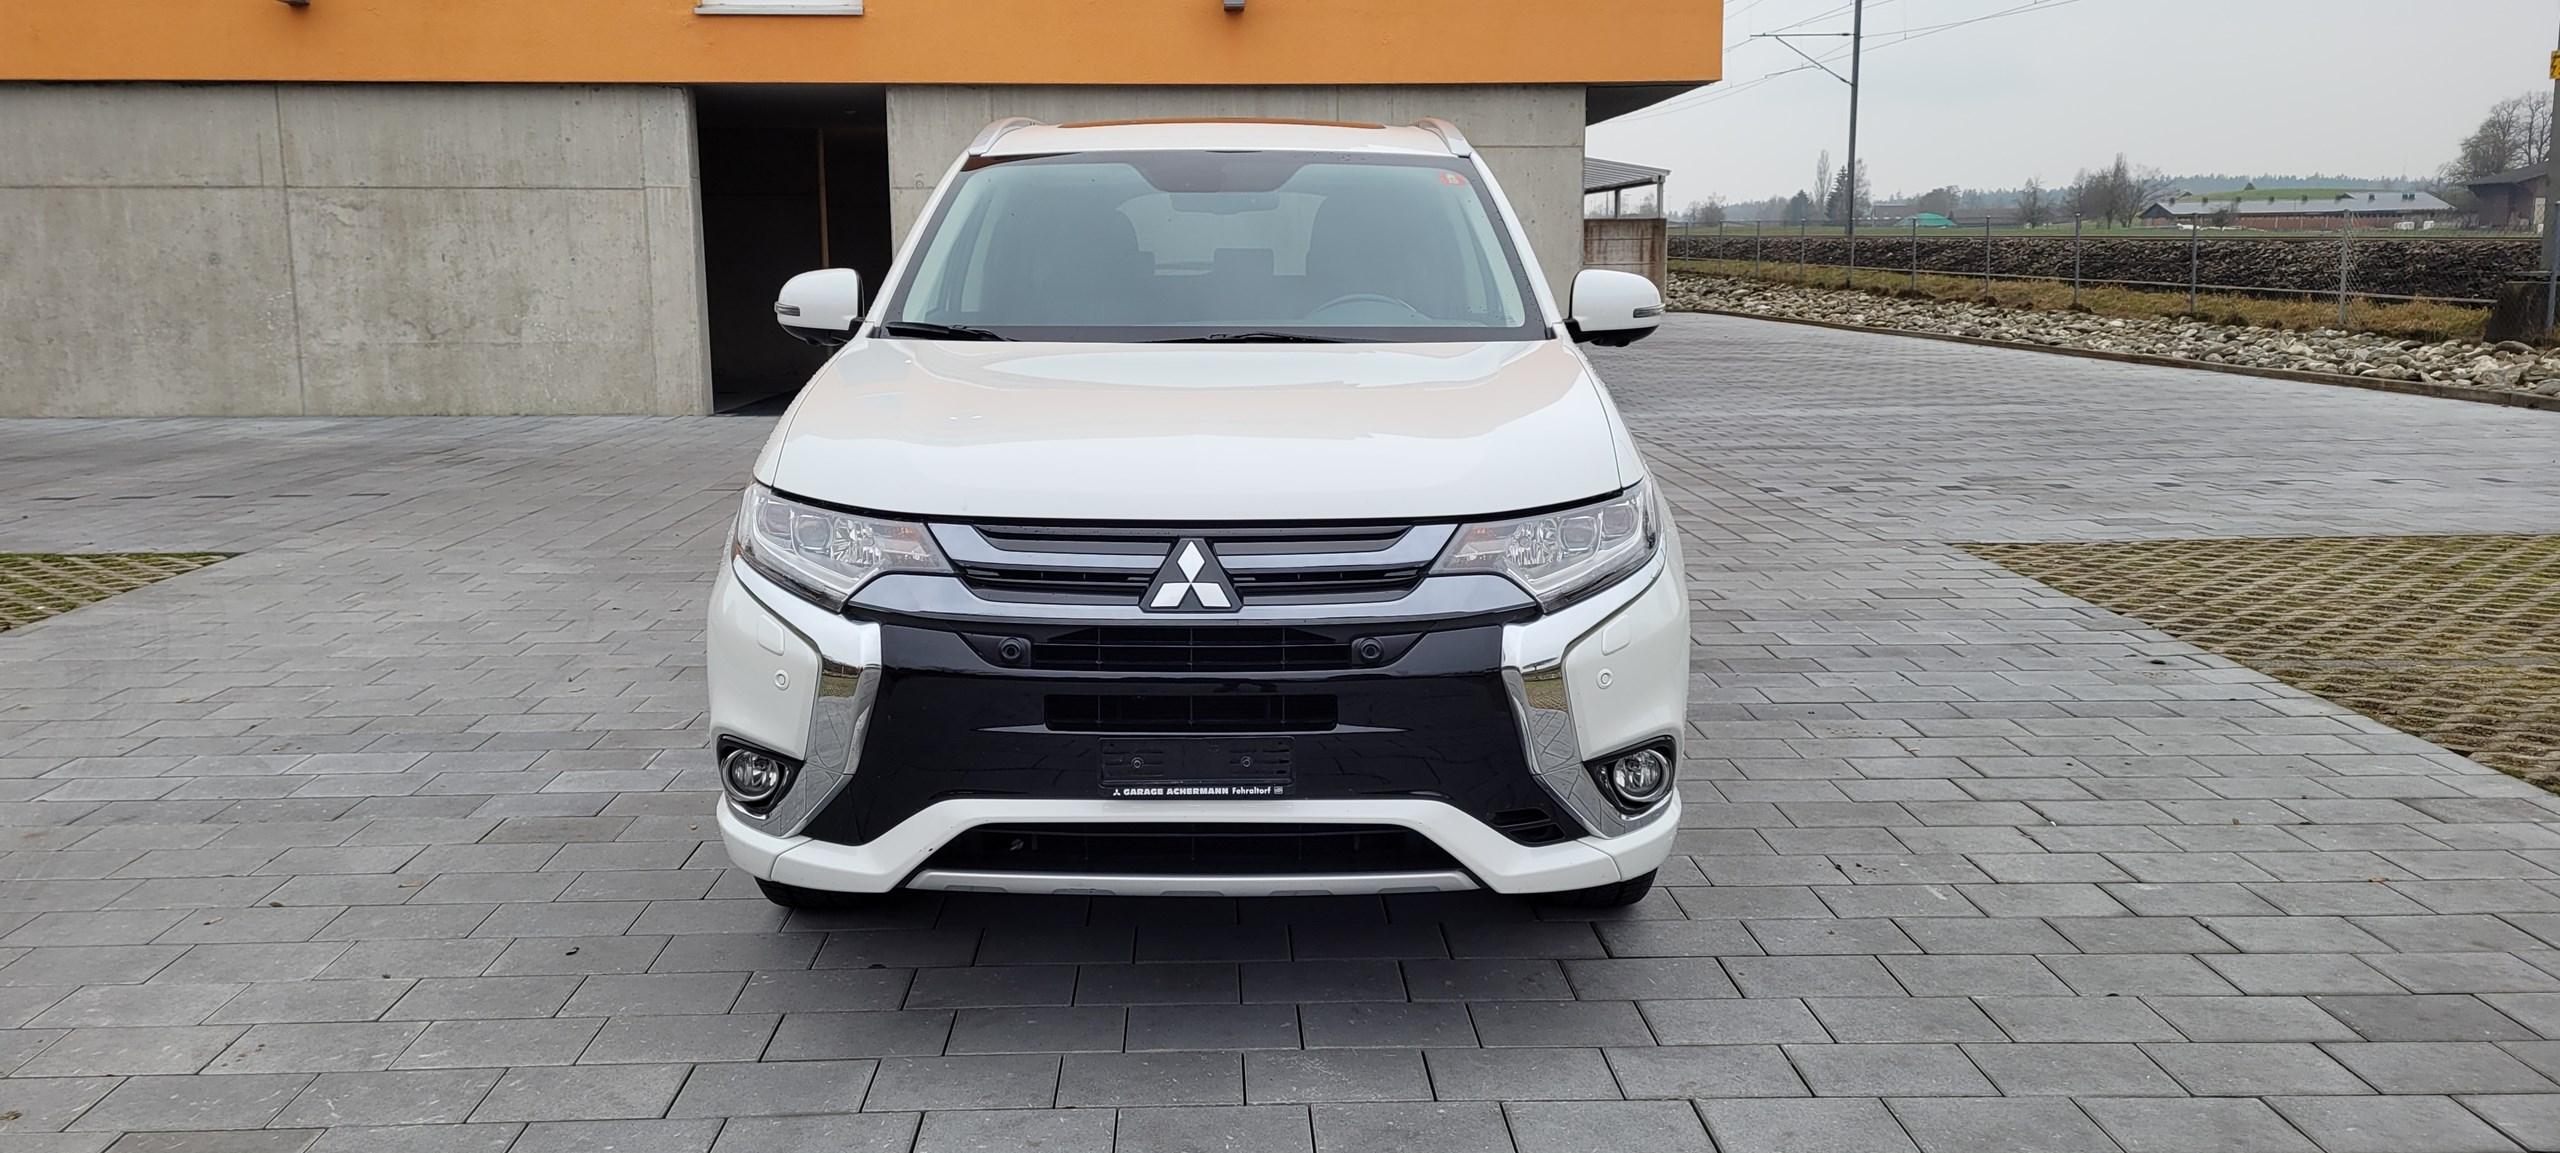 suv Mitsubishi Outlander 2.0 PHEV Diamond 4WD Automatic